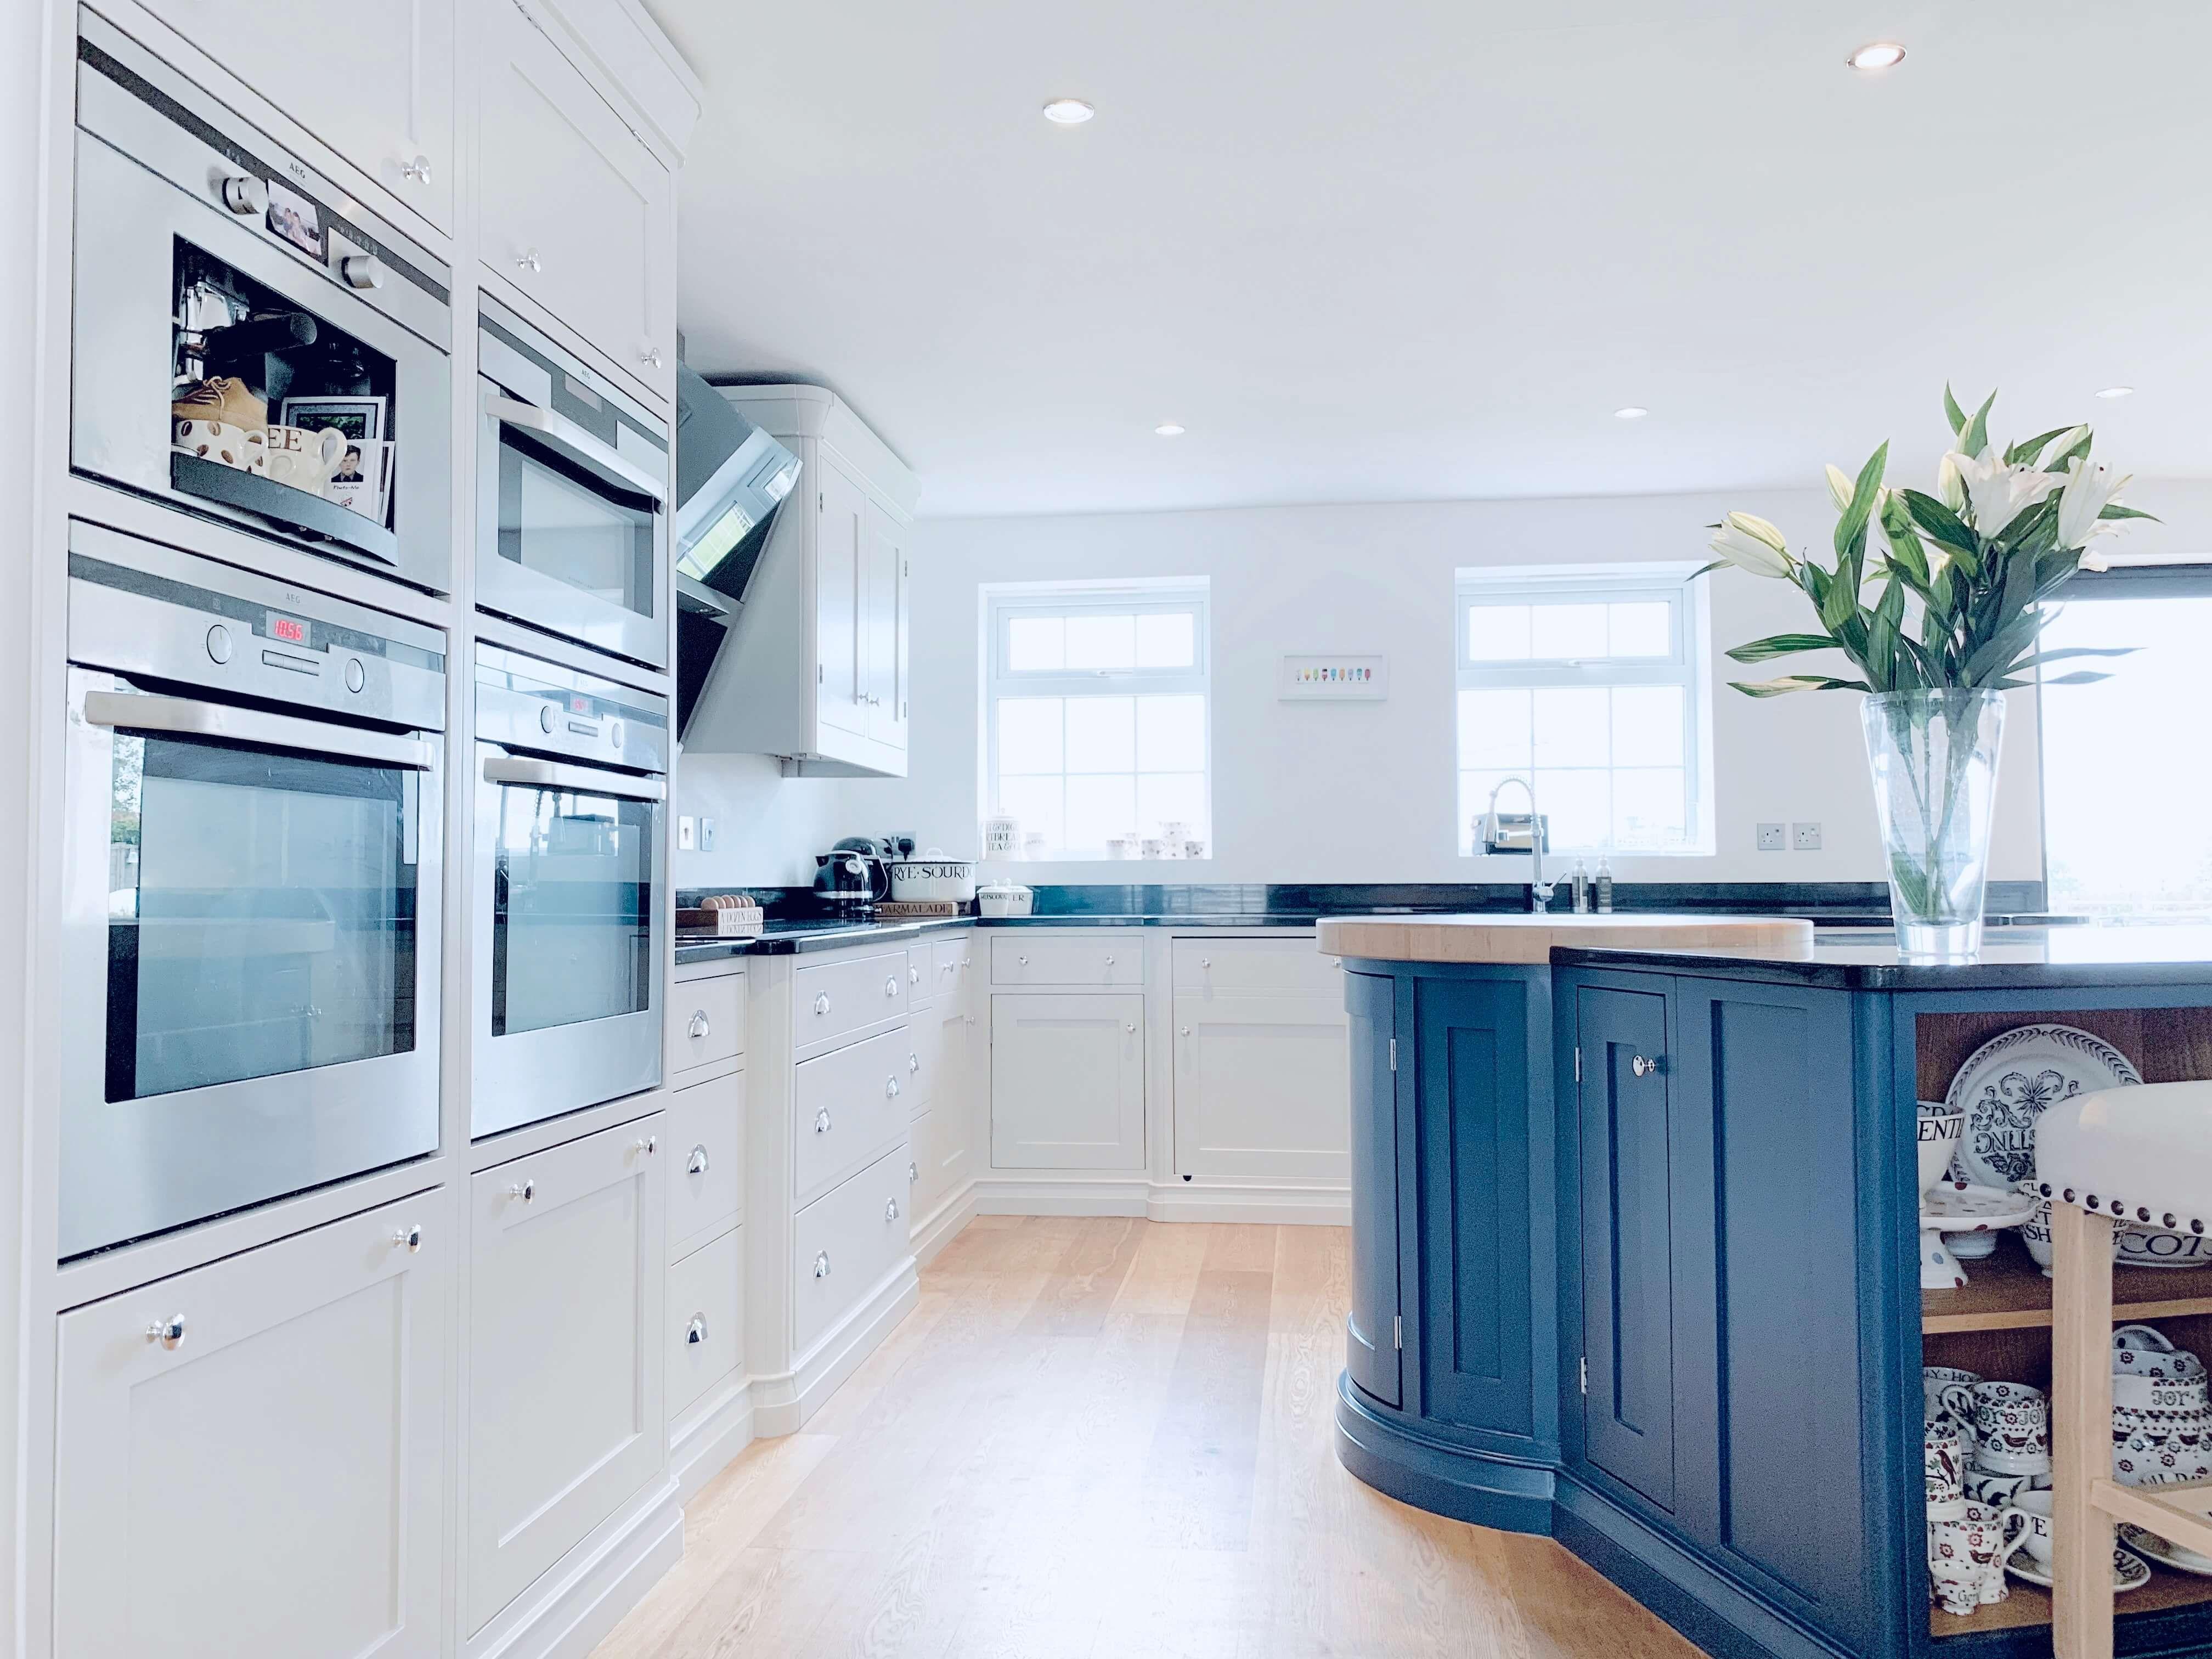 Best Kitchen Cabinets Painted In Farrow Ball Stiffkey Blue 400 x 300